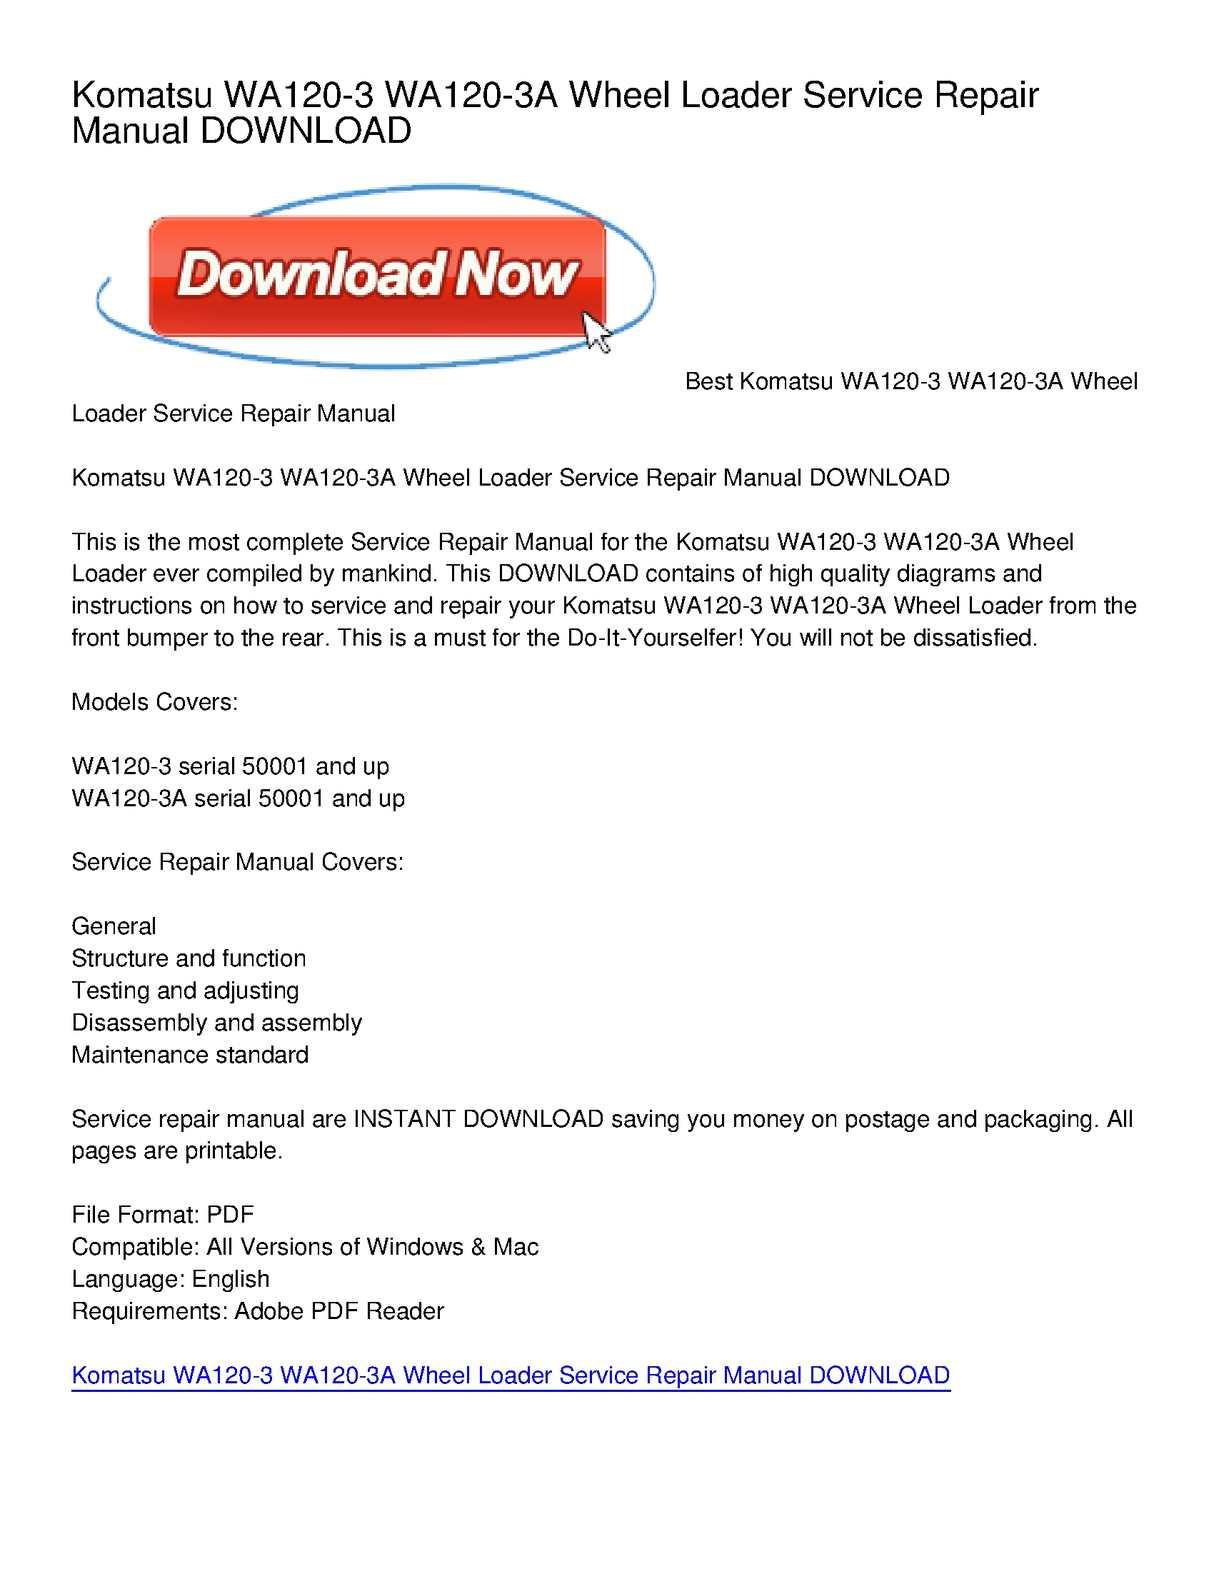 Calaméo - Komatsu WA120-3 WA120-3A Wheel Loader Service Repair Manual  DOWNLOAD